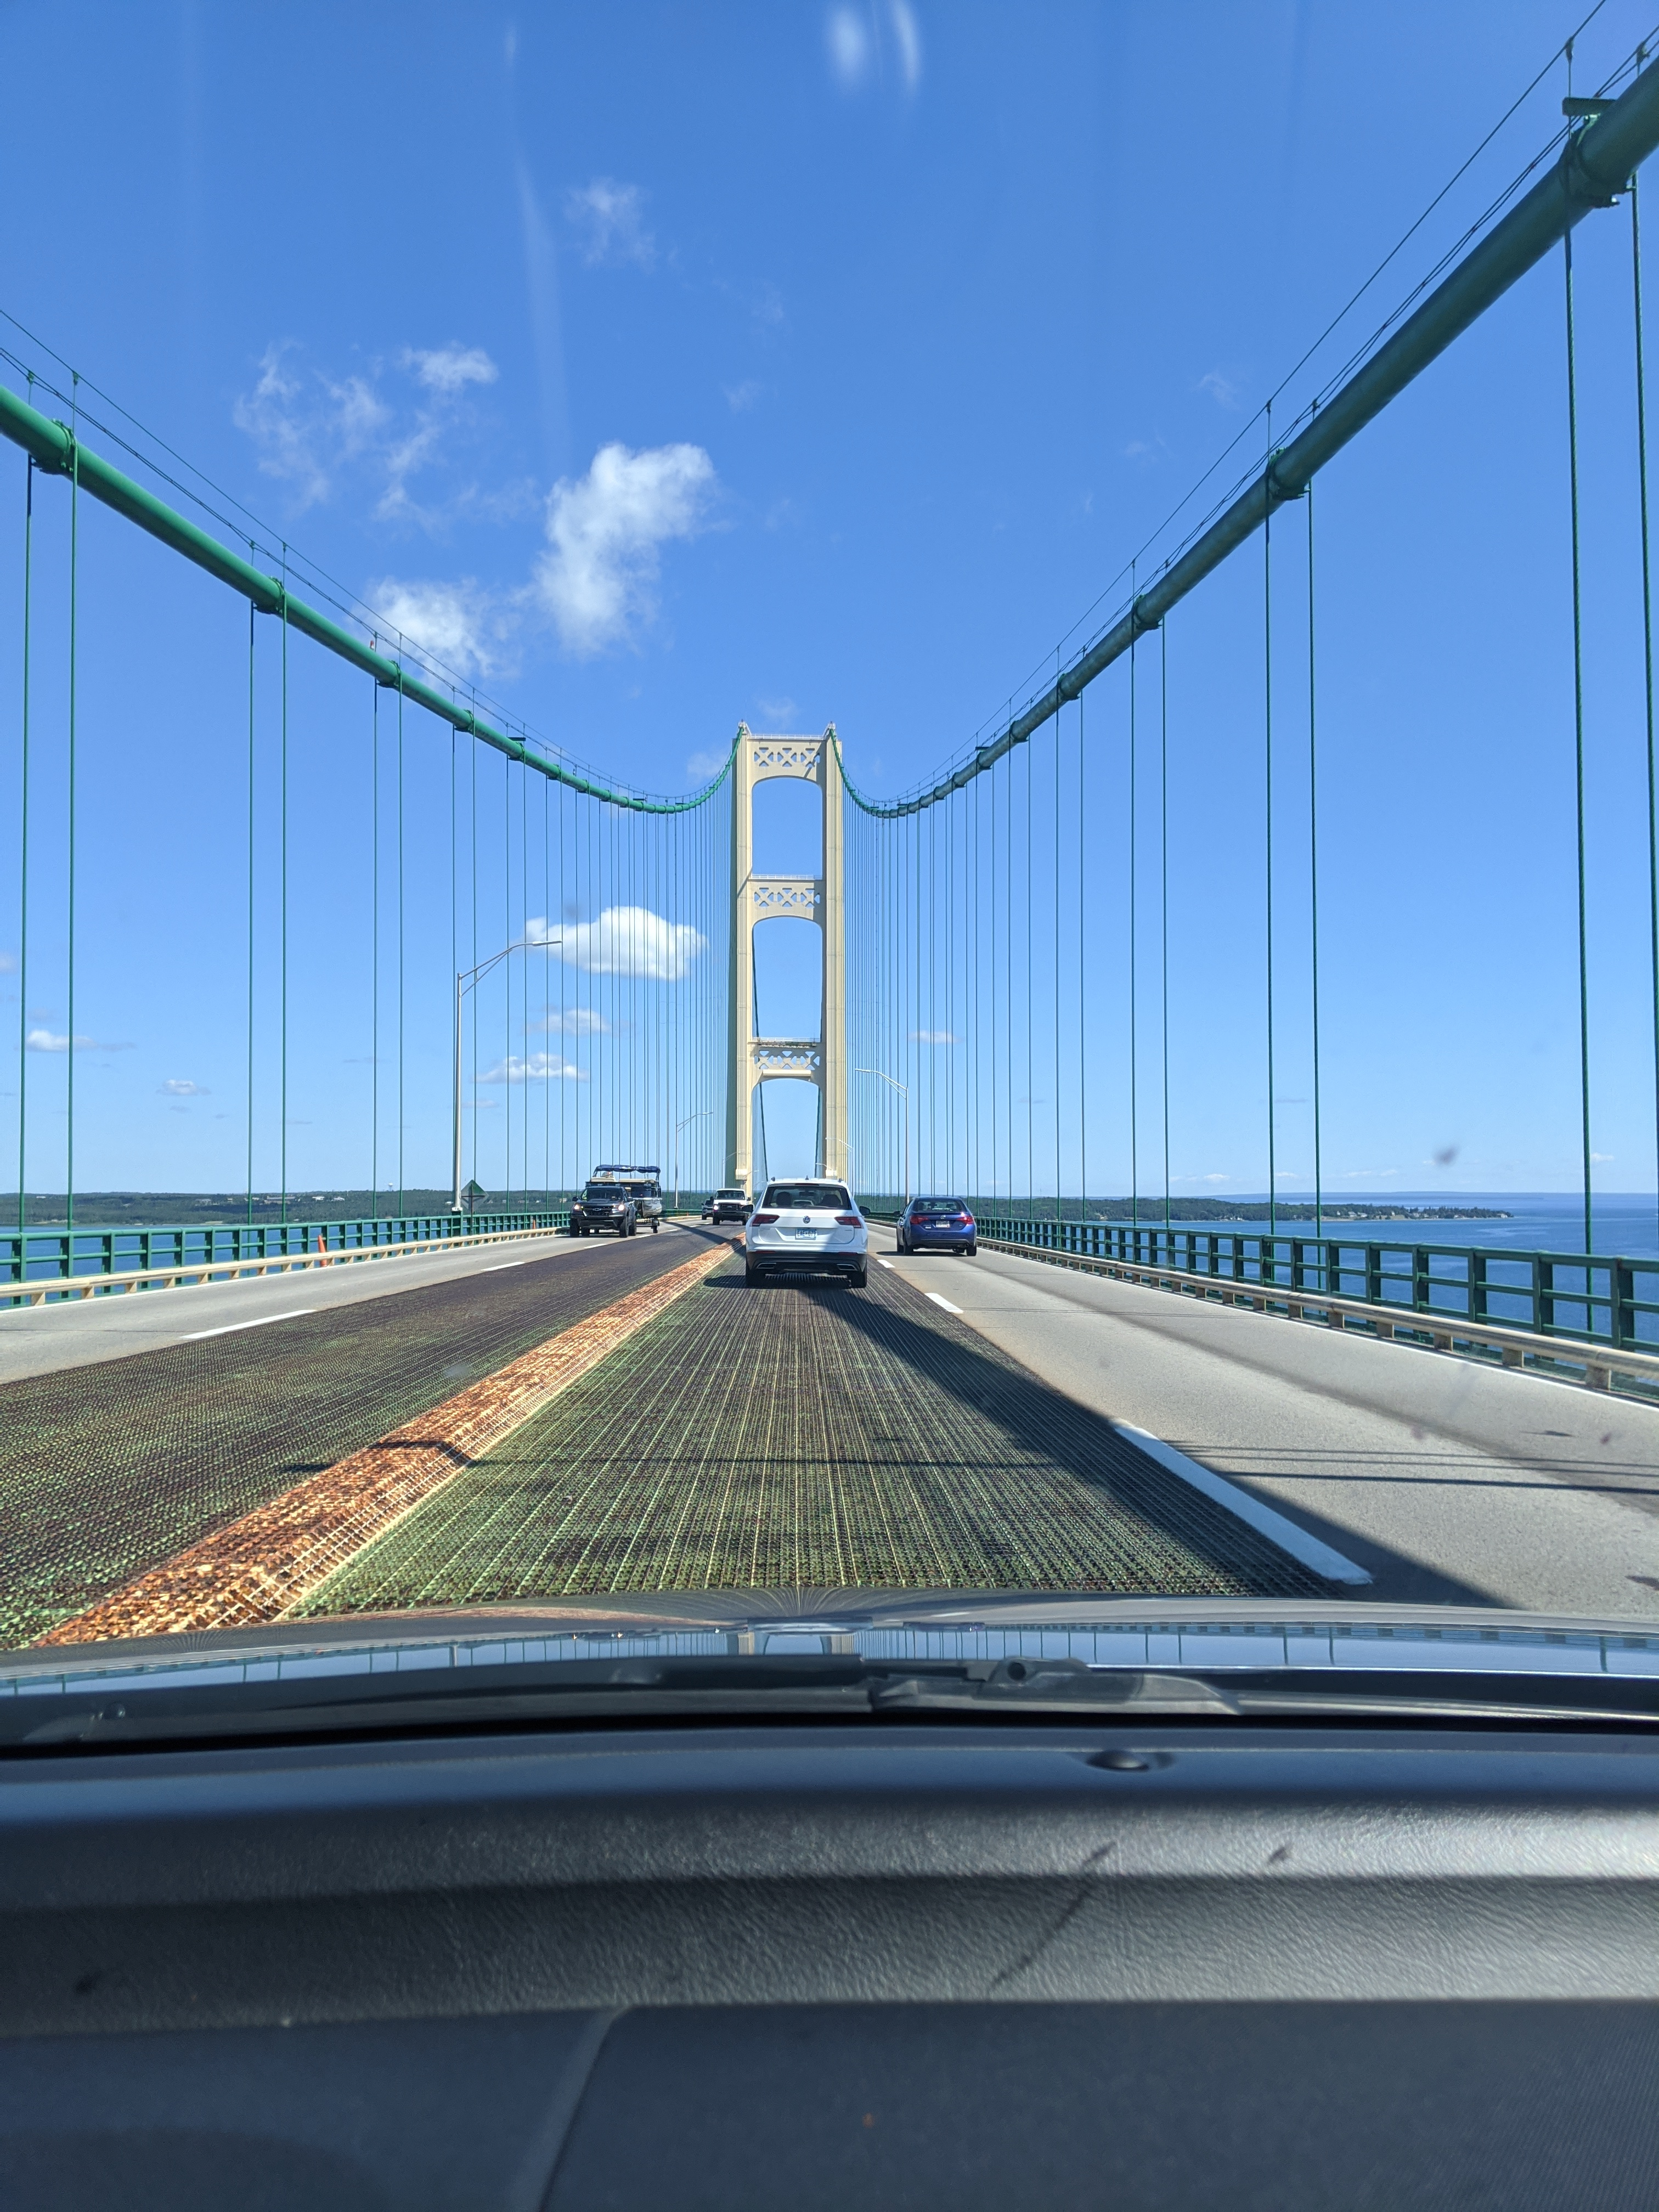 Mackinac Island Bridge with blue sky